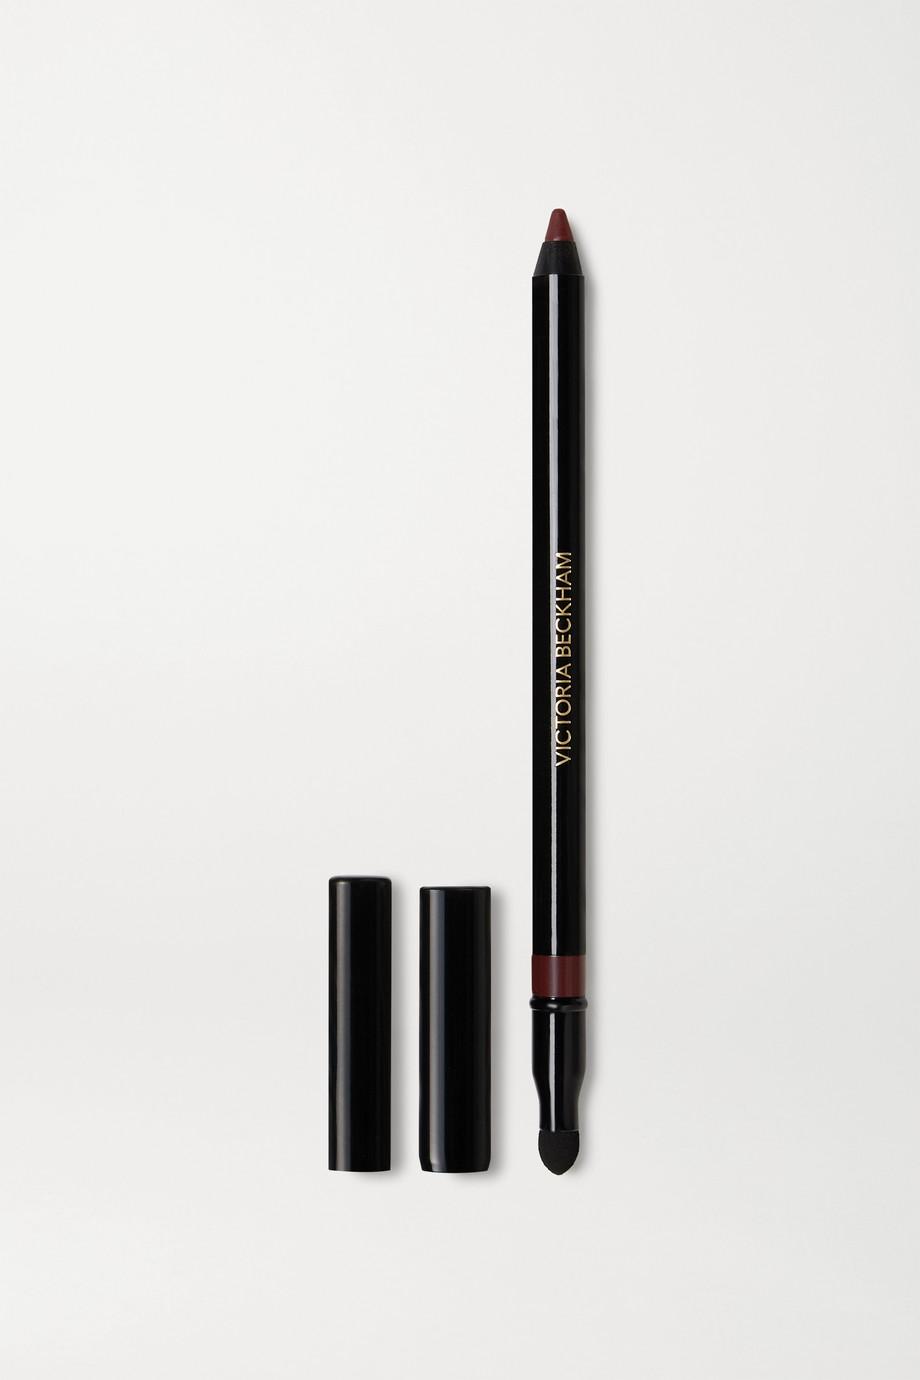 Victoria Beckham Beauty Satin Kajal Liner - Bordeaux